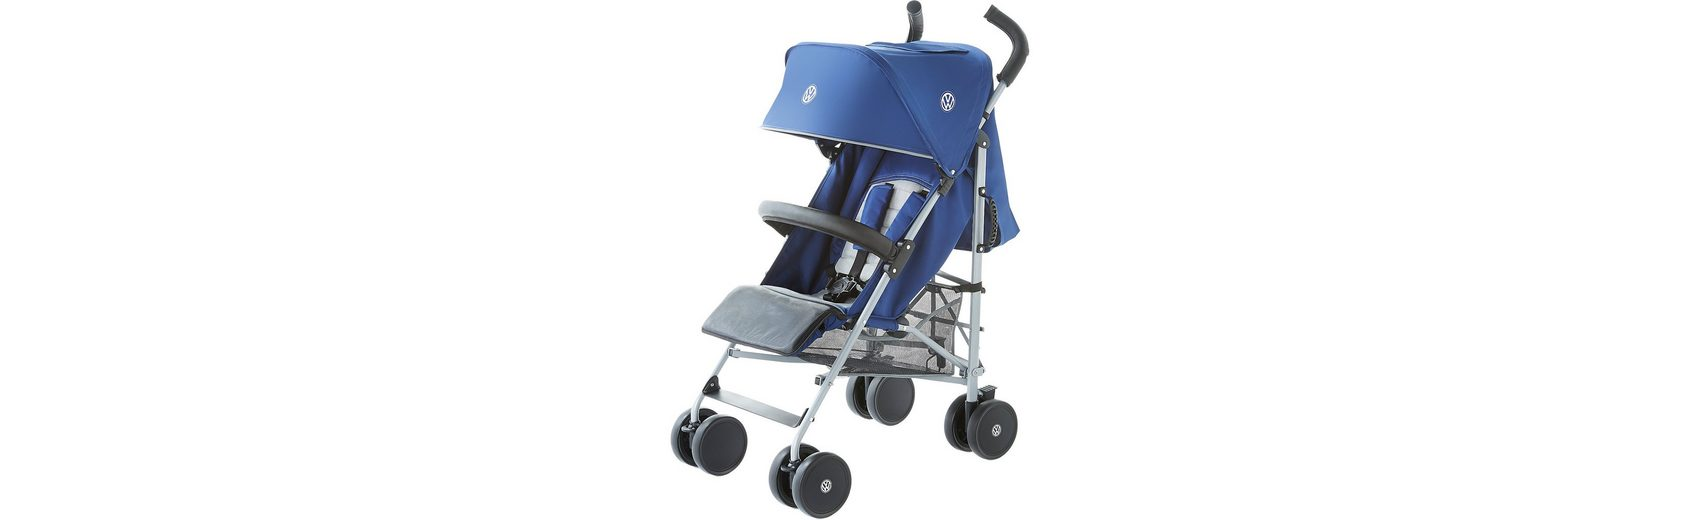 knorr-baby Buggy Volkswagen Compact, Blau